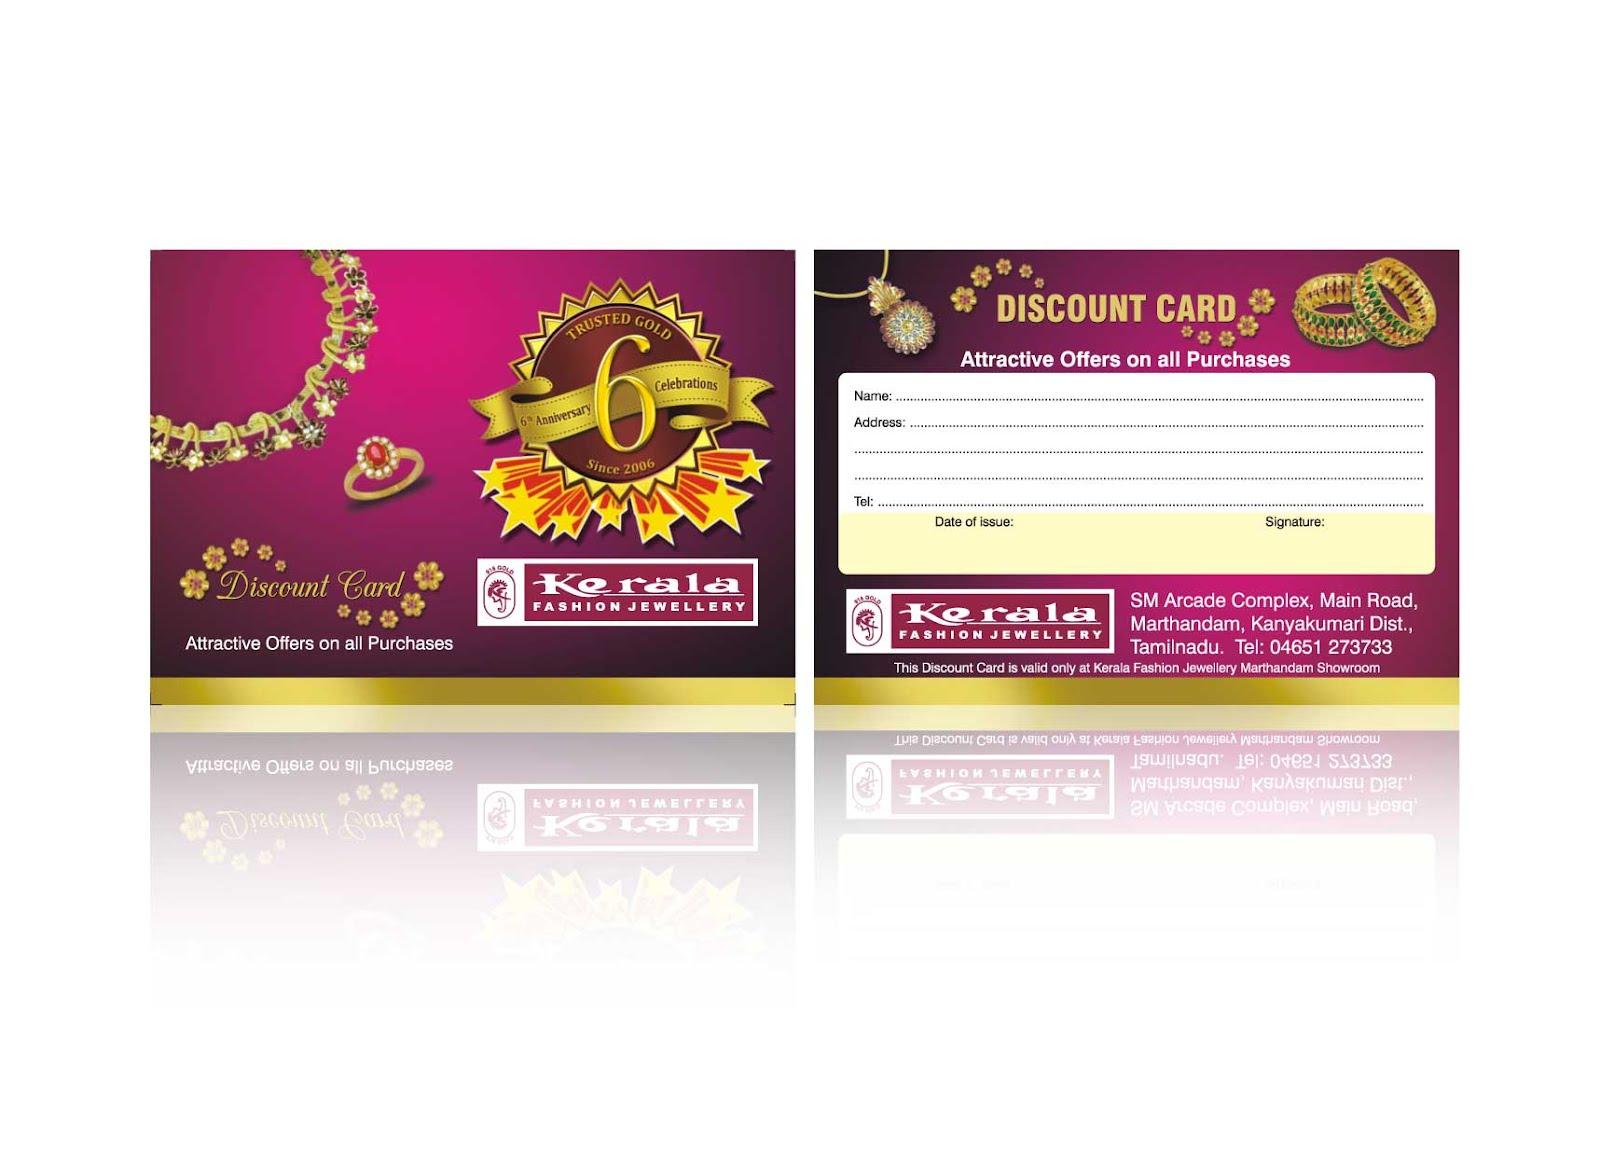 Design of discount card - Gold Discount Card Design